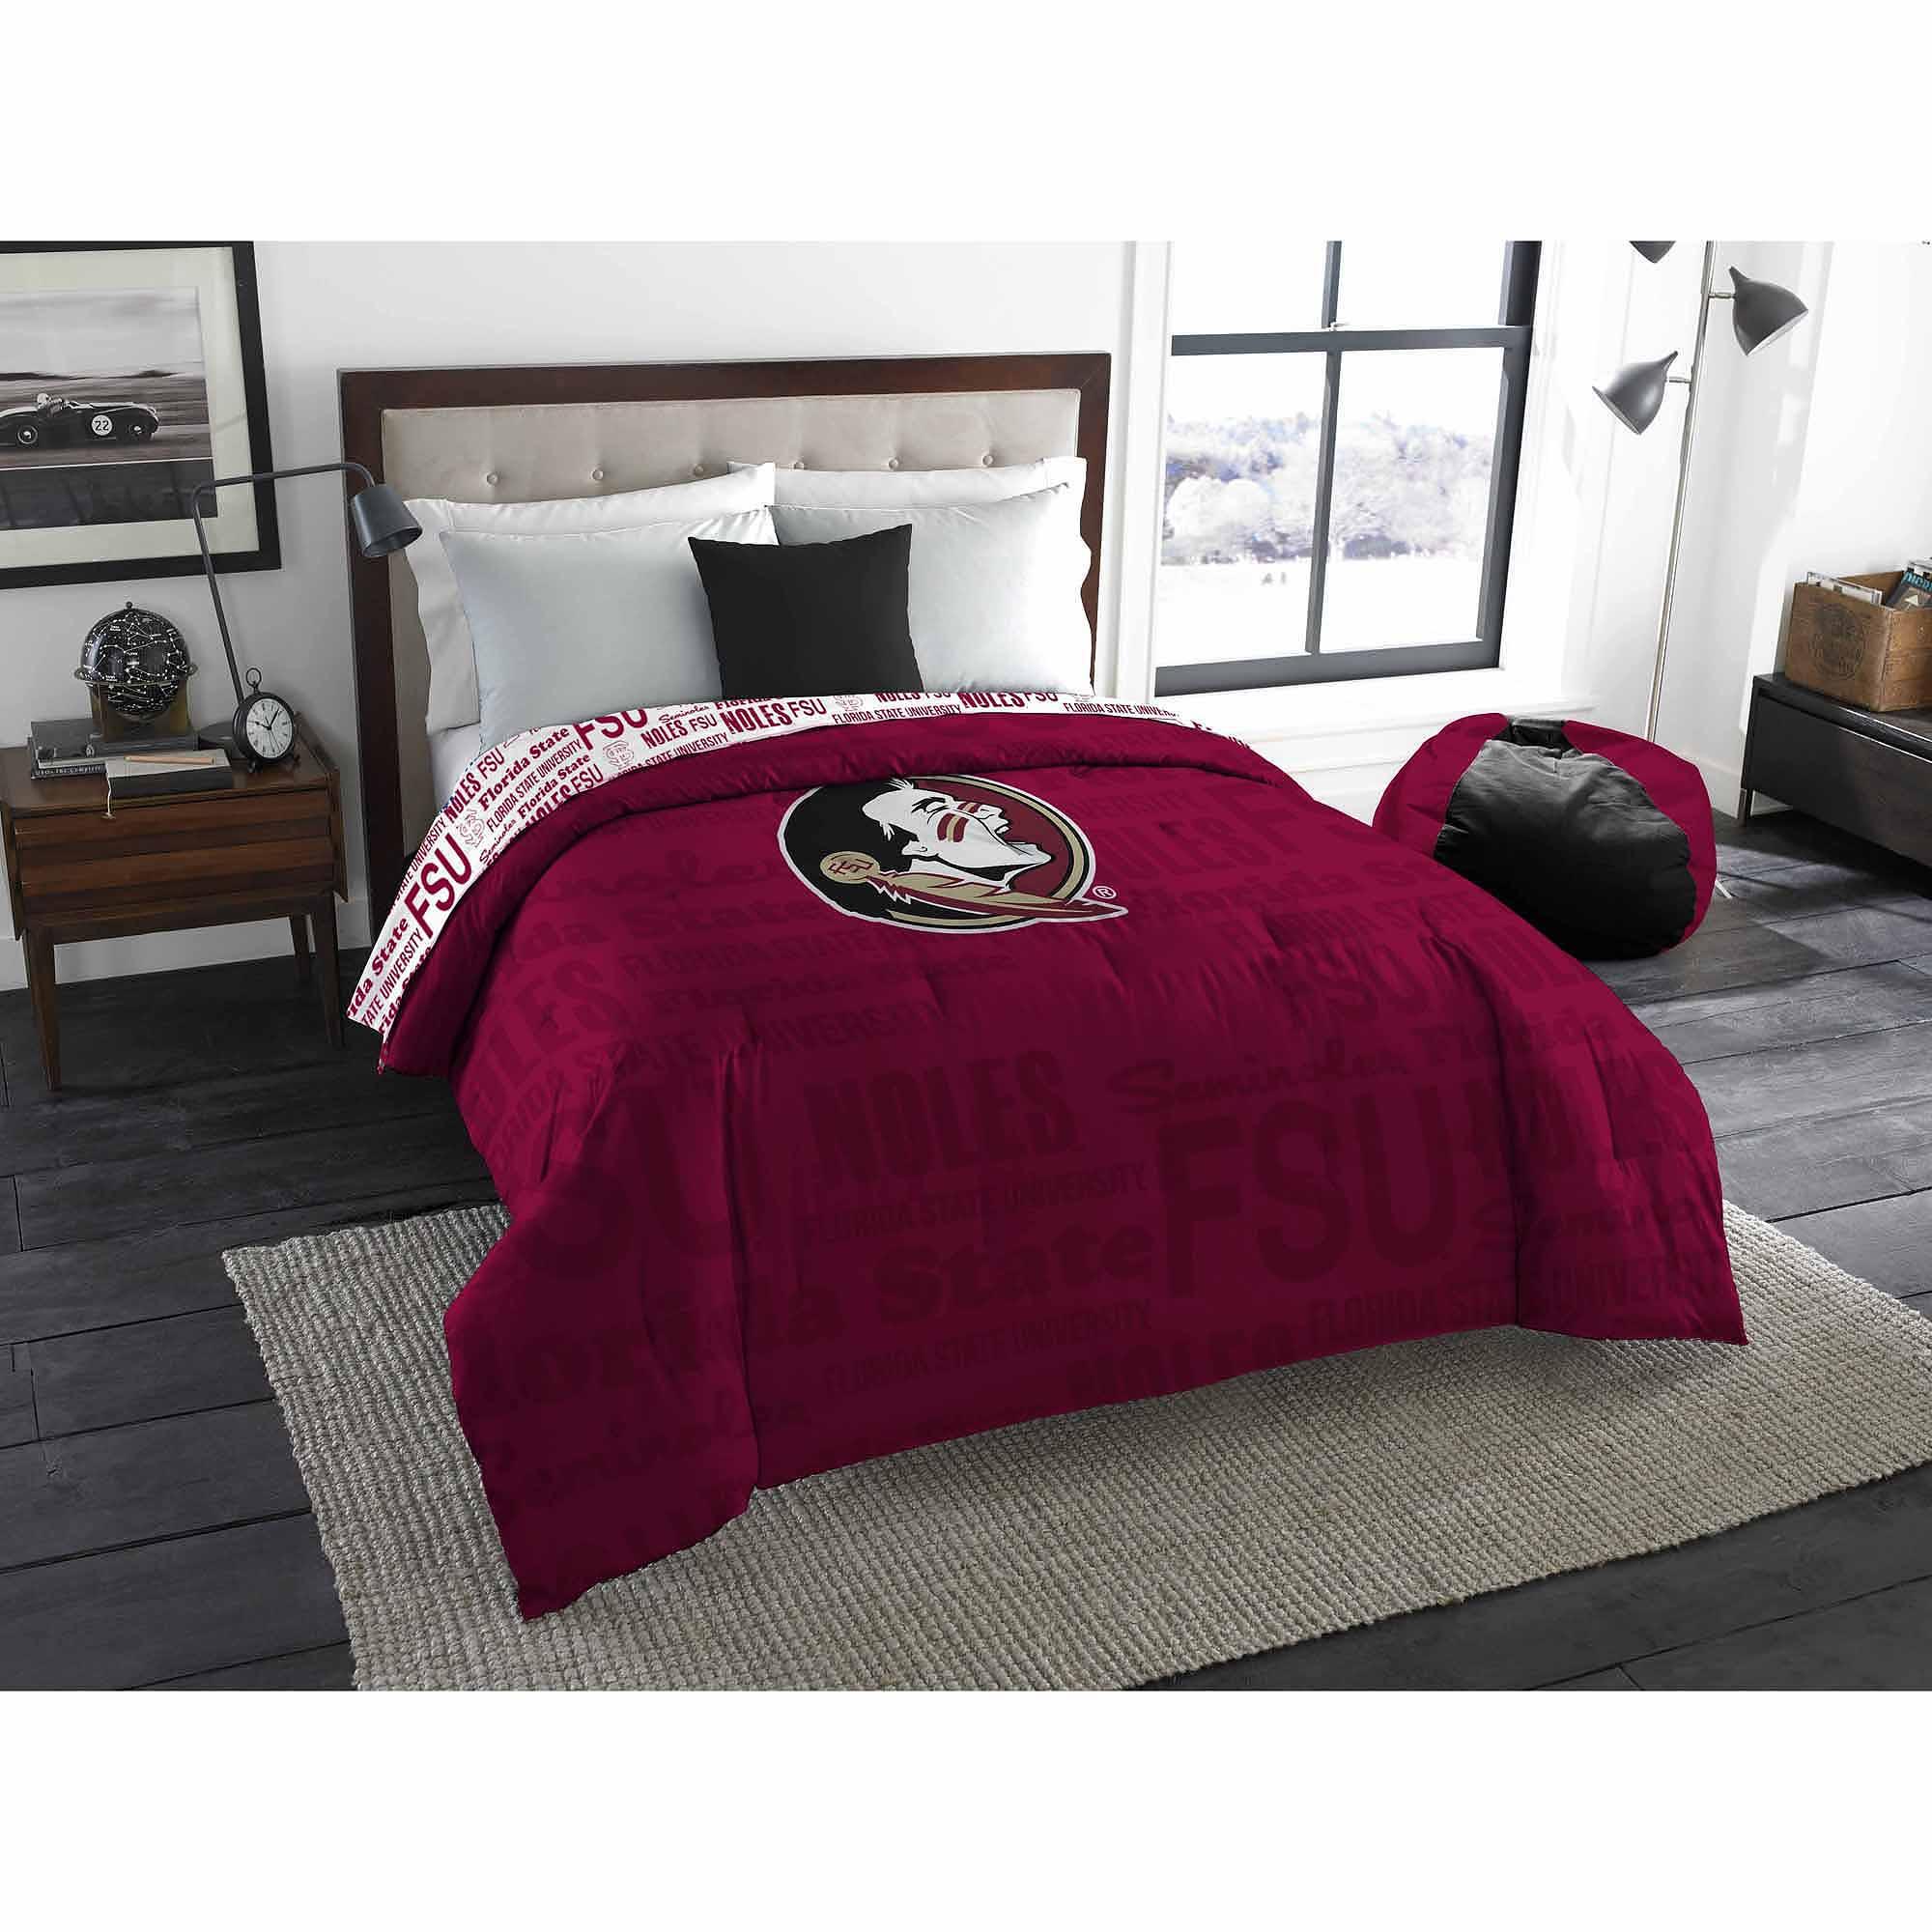 NCAA Florida State Seminoles Twin or Full Bedding Comforter, 1 Each